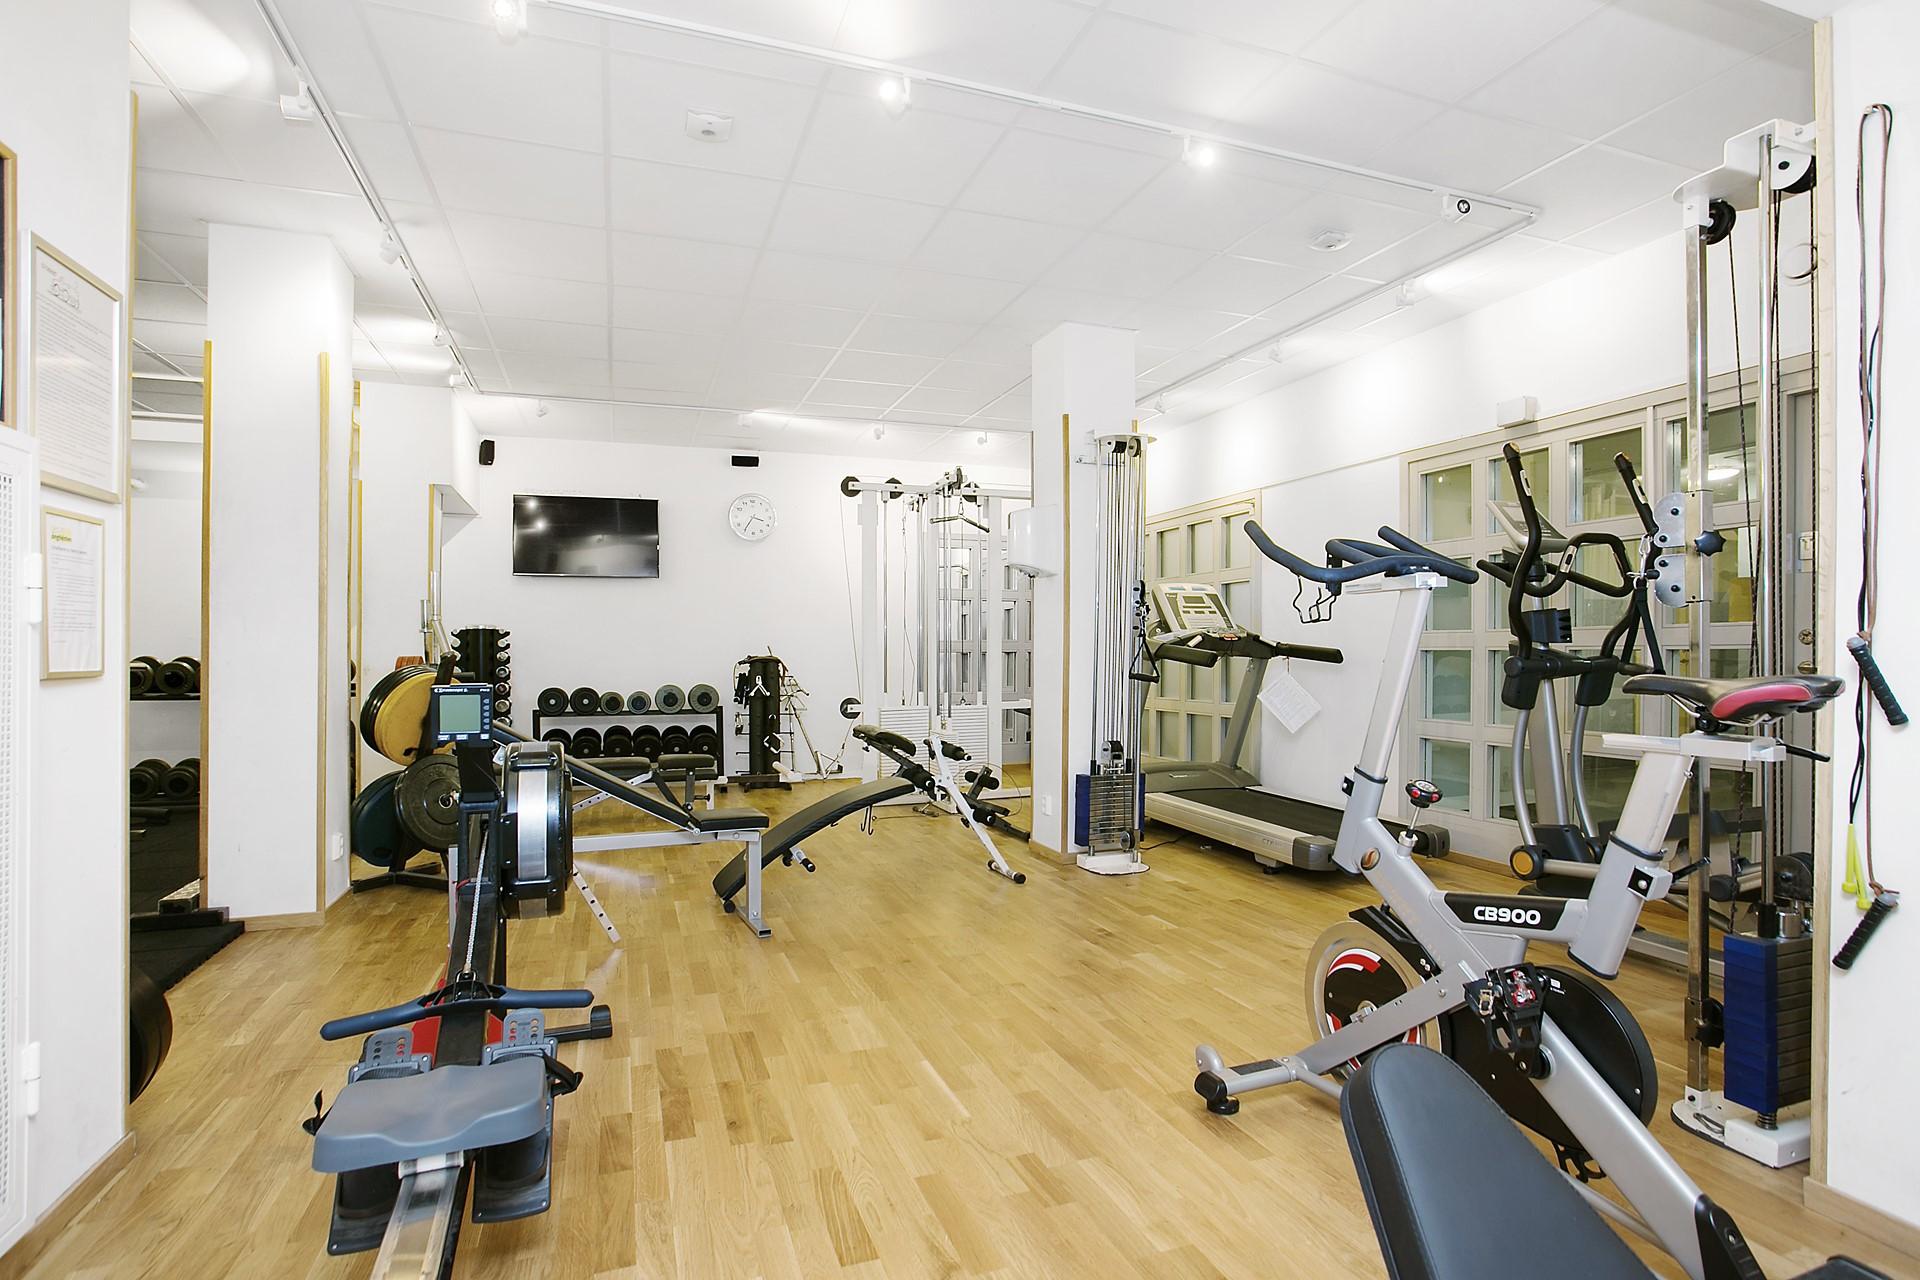 Maria Bangata 9, 5 tr - Ett riktigt gym!!